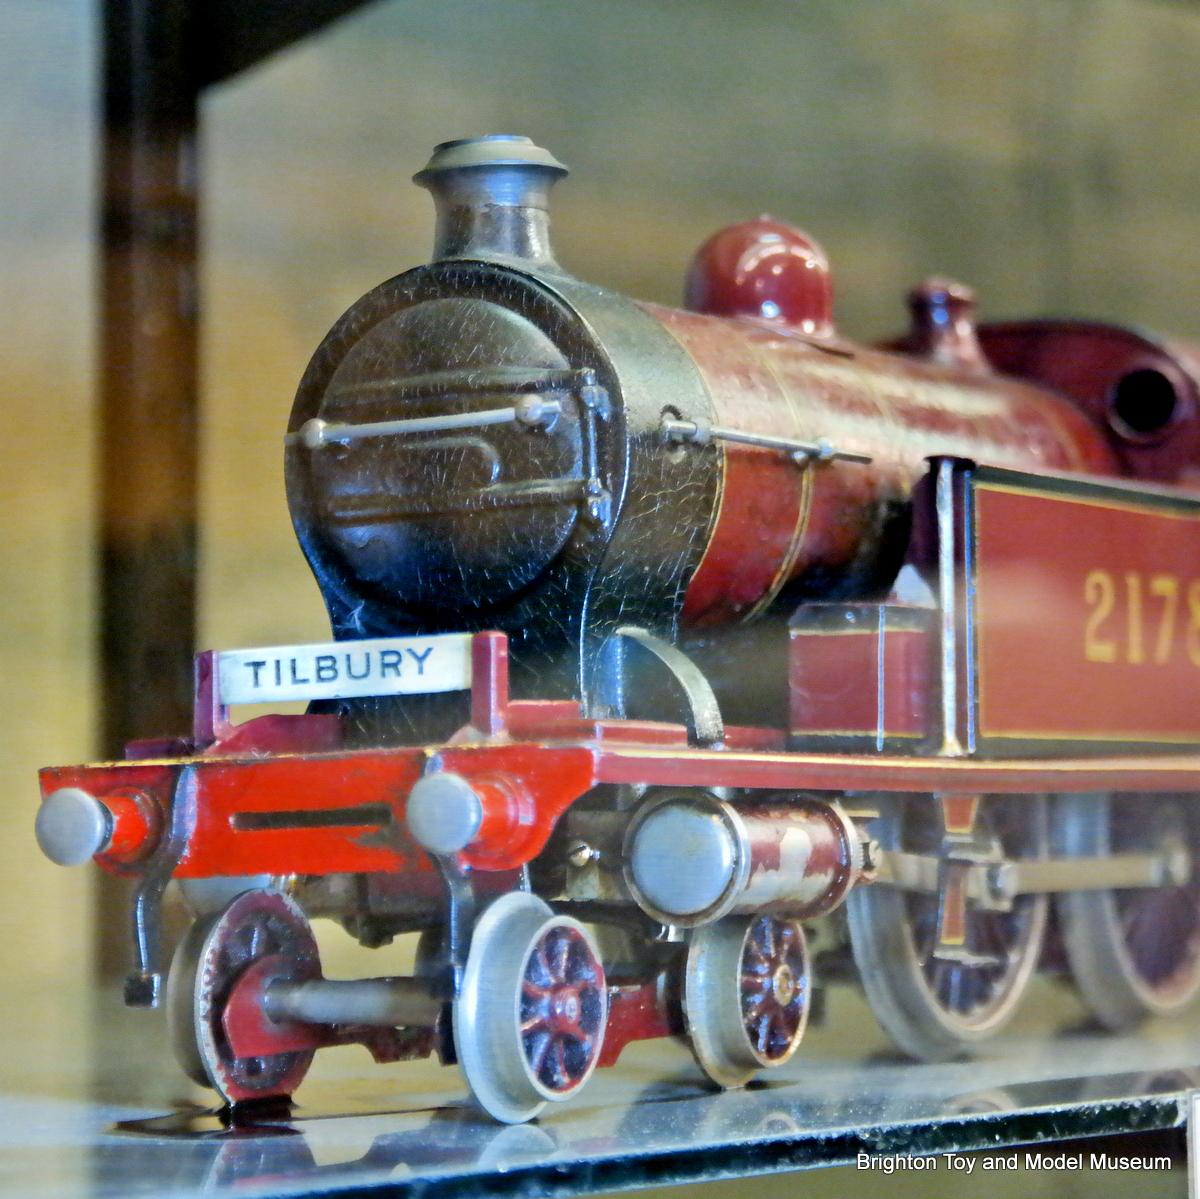 midland railway locomotive 2178 bing for bassettlowke